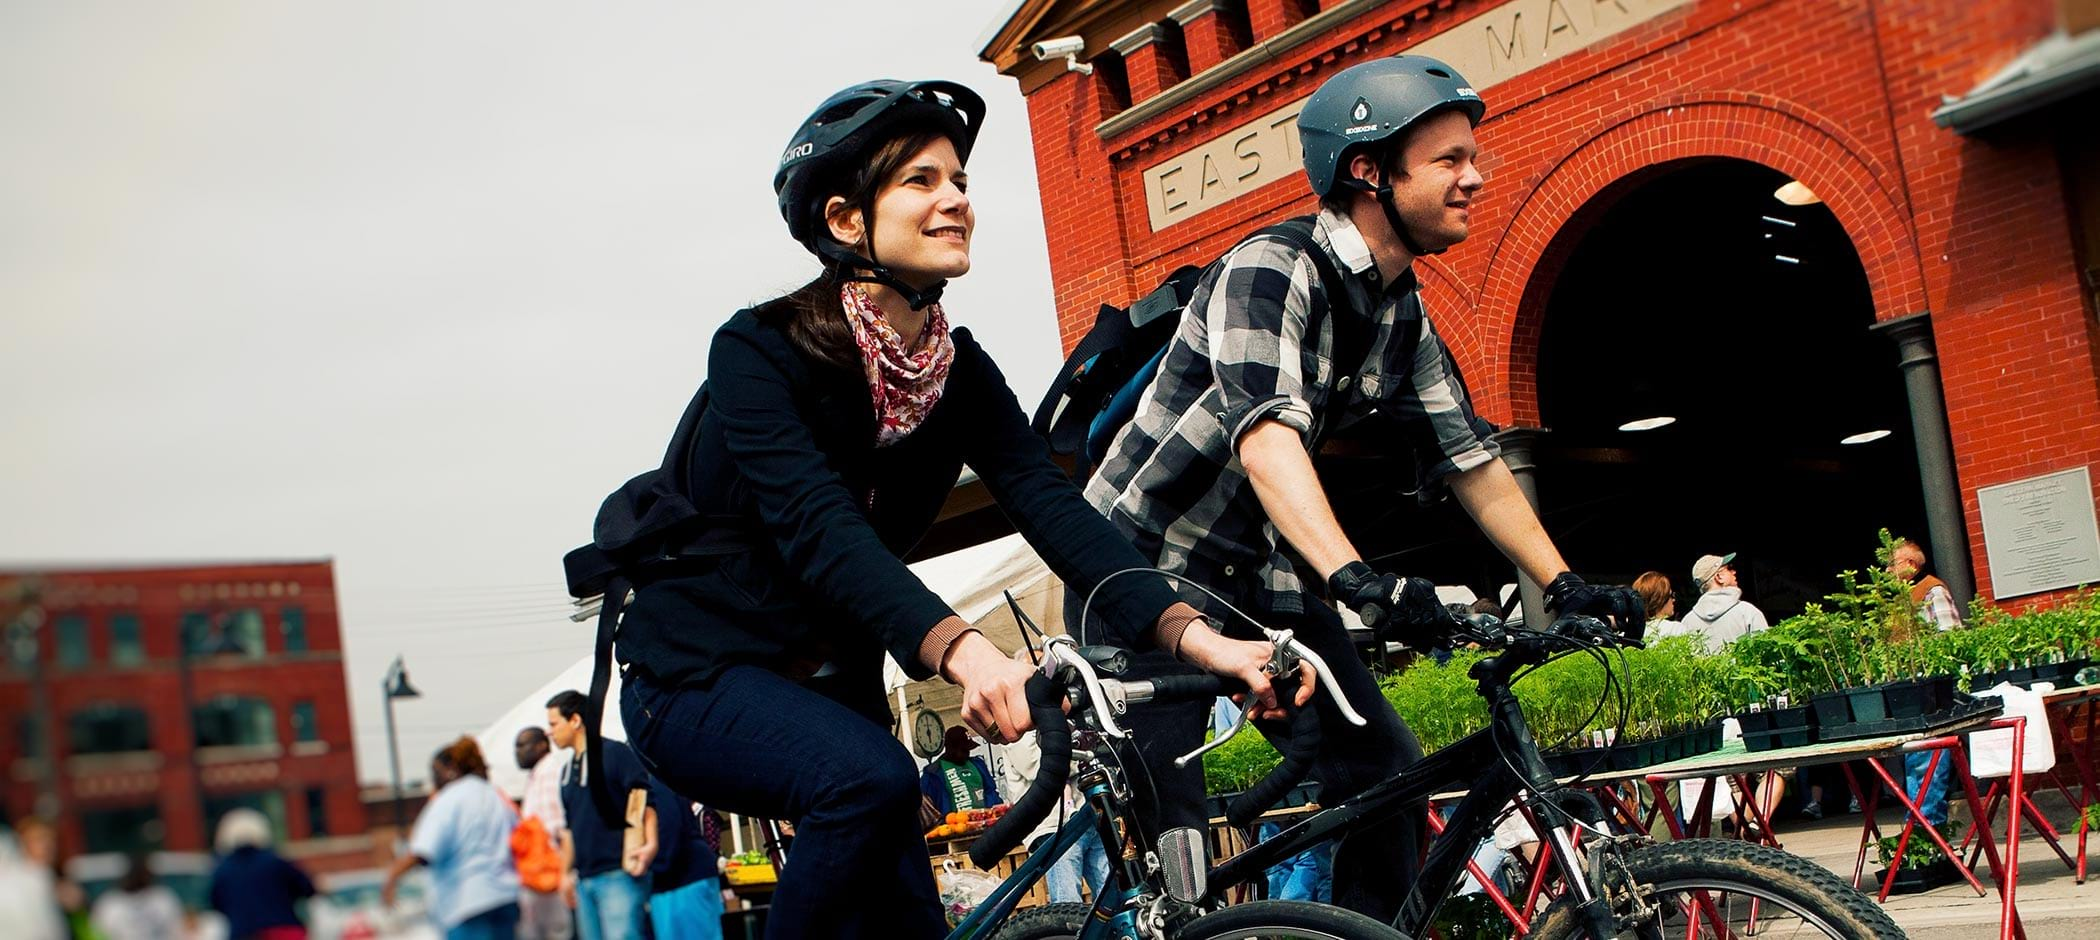 bike riders at Eastern Market